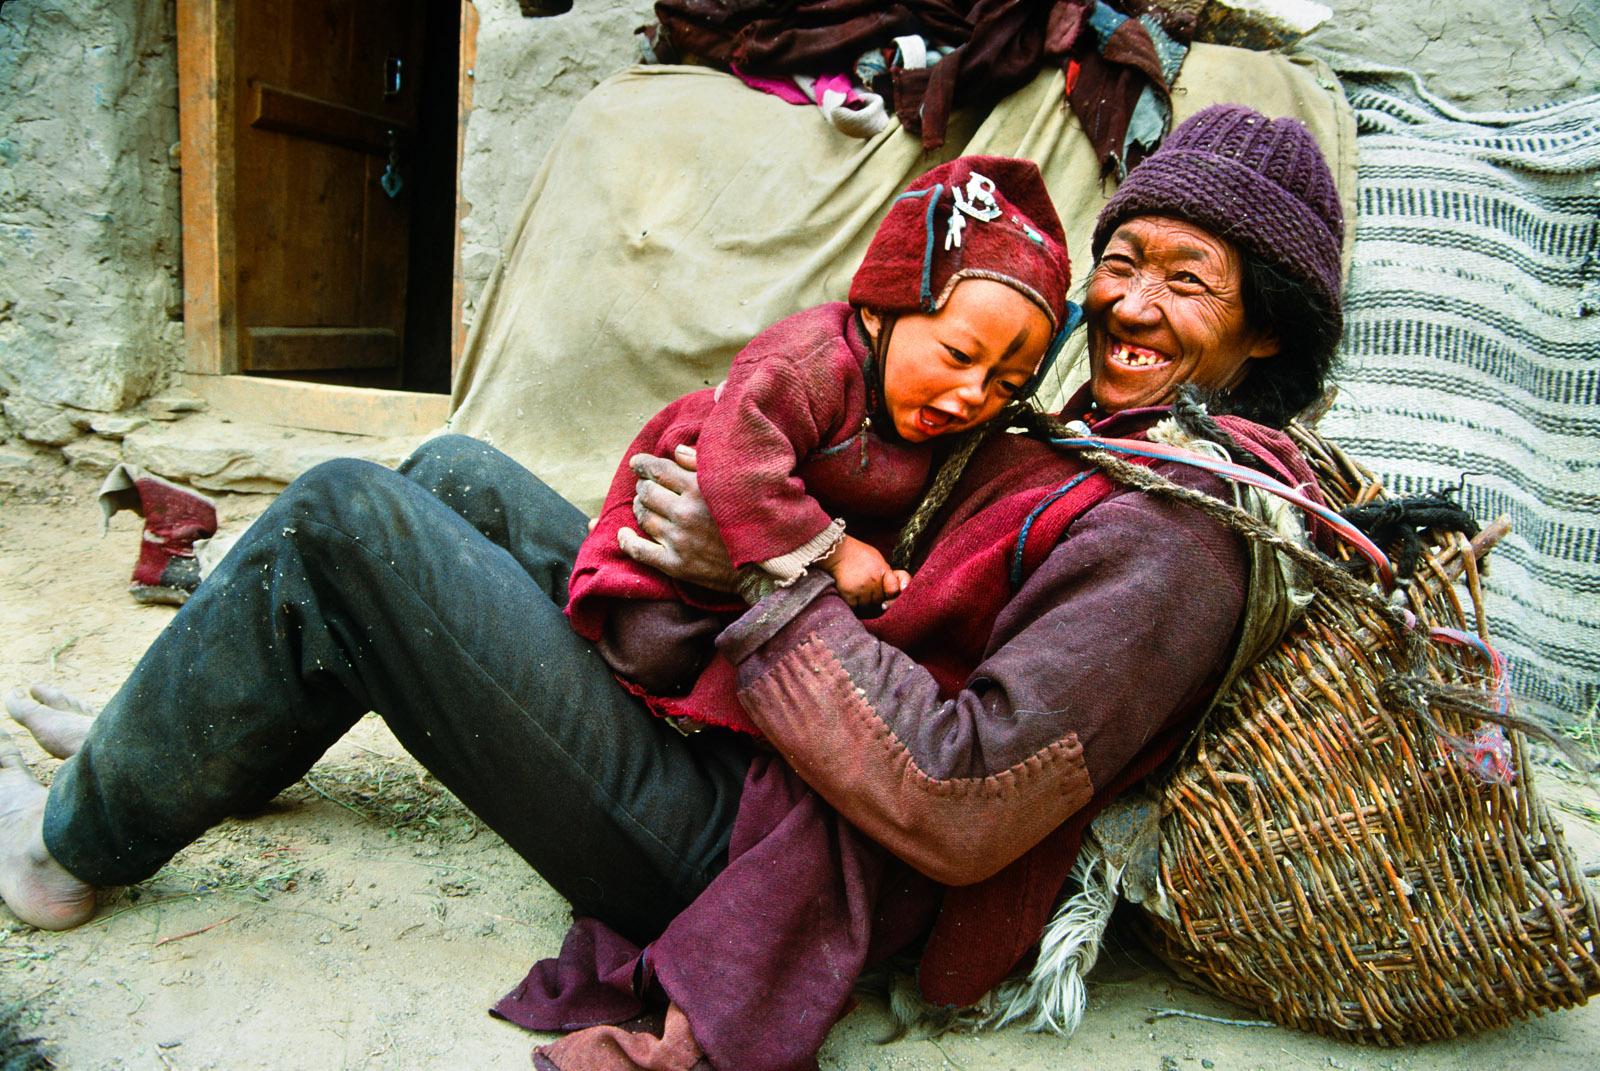 Ladakhi grandmother plays with child in Ating, district of Zanskar, Ladakh region. India .1993.